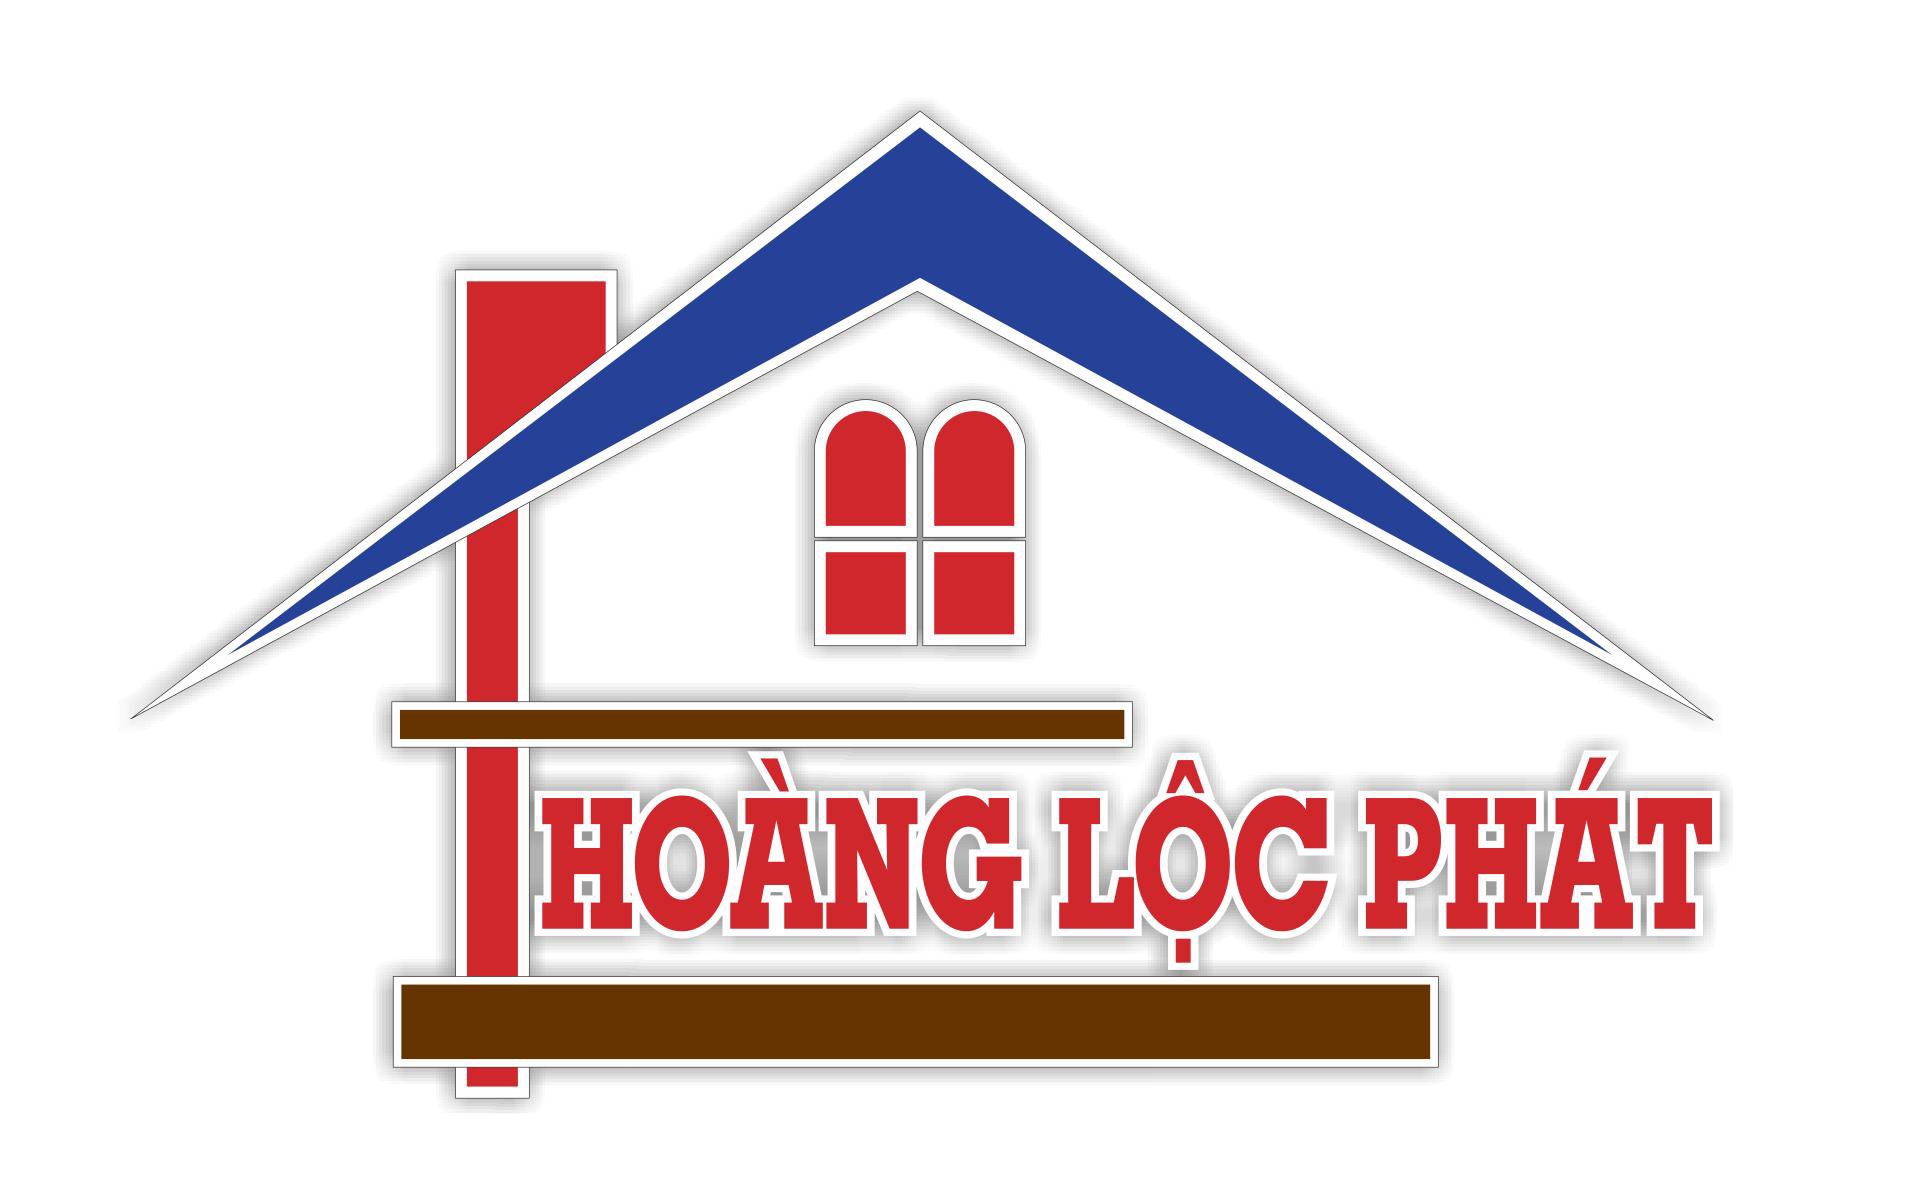 logo-cong-ty-hoang-loc-phat